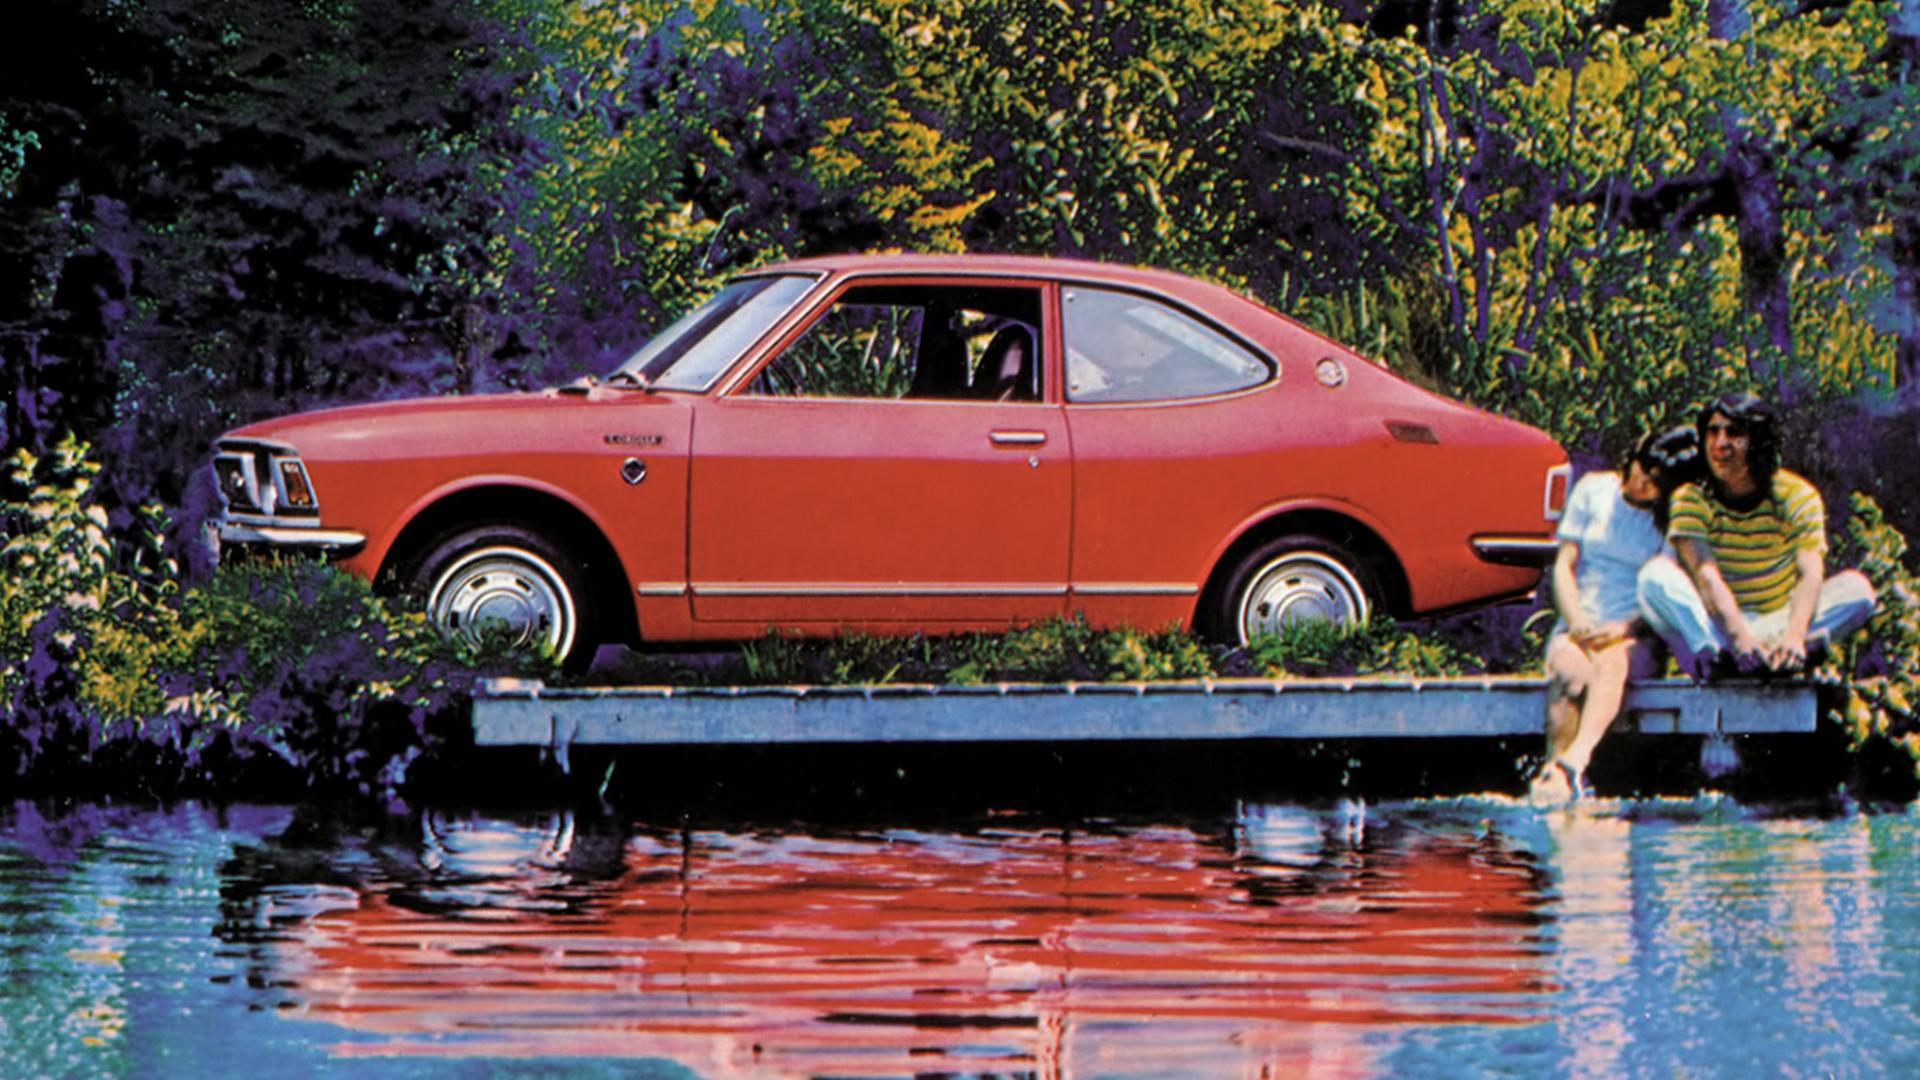 Kelebihan Toyota Corolla Classic Murah Berkualitas